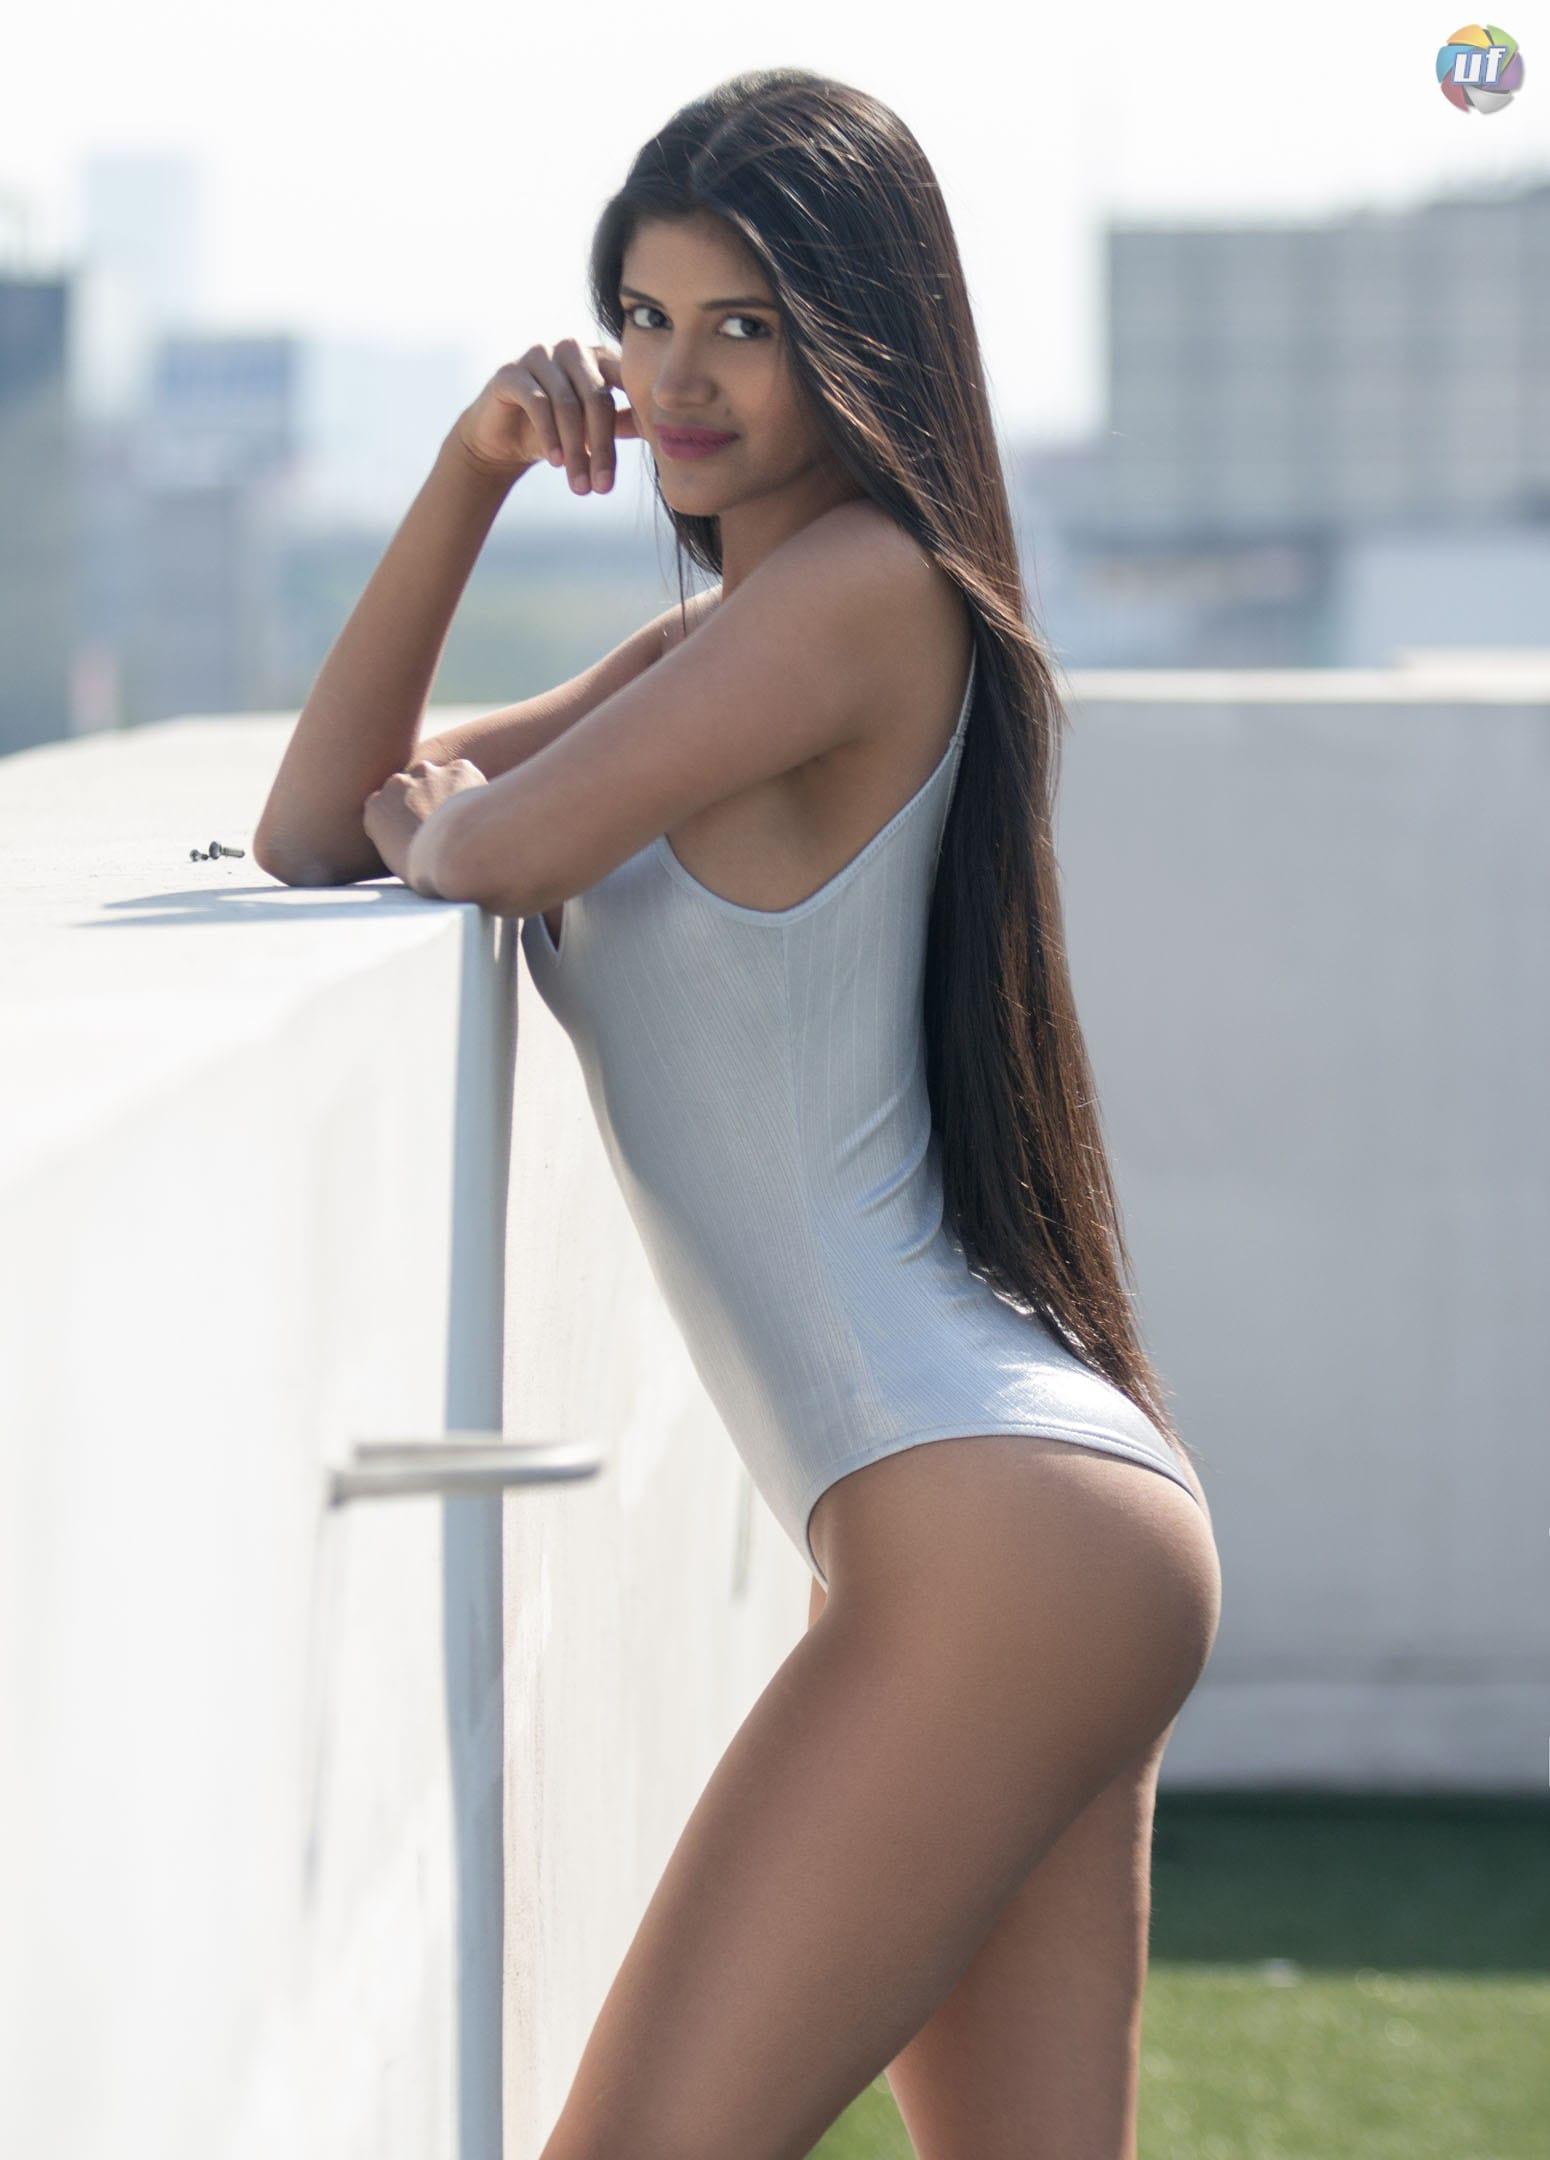 Irene Velazquez Una Morena Maravillosa